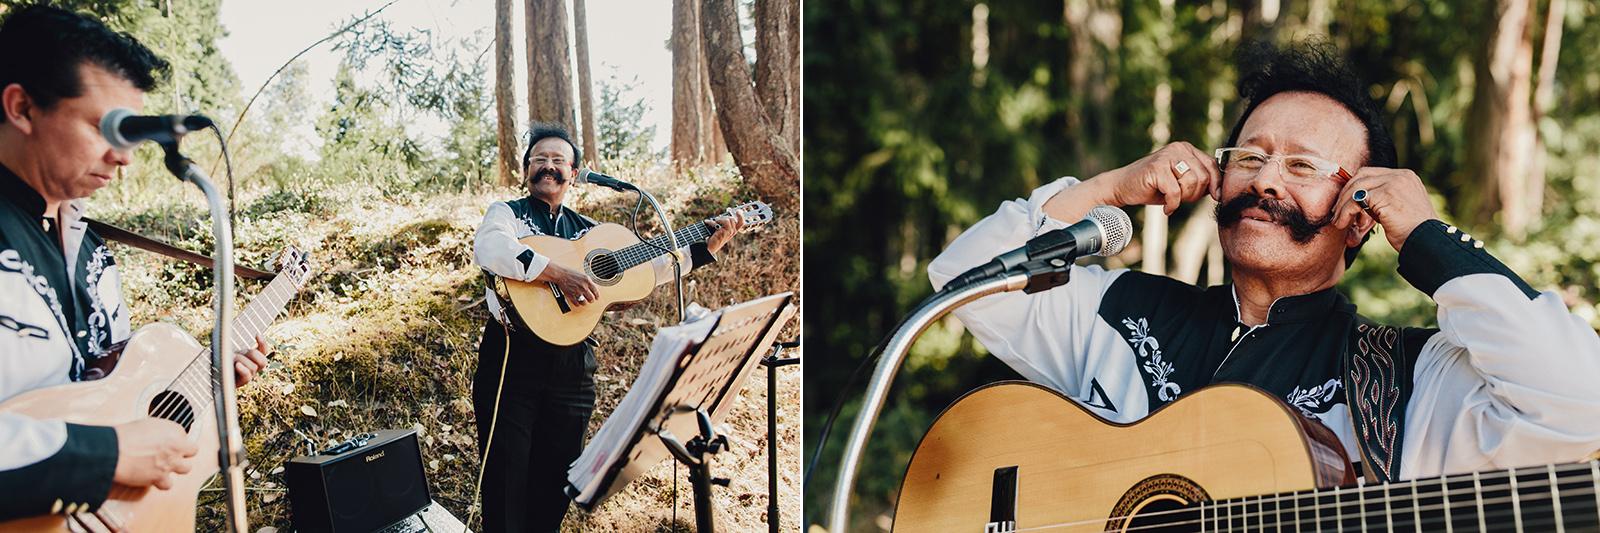 mexican-preformers-at-wedding.jpg